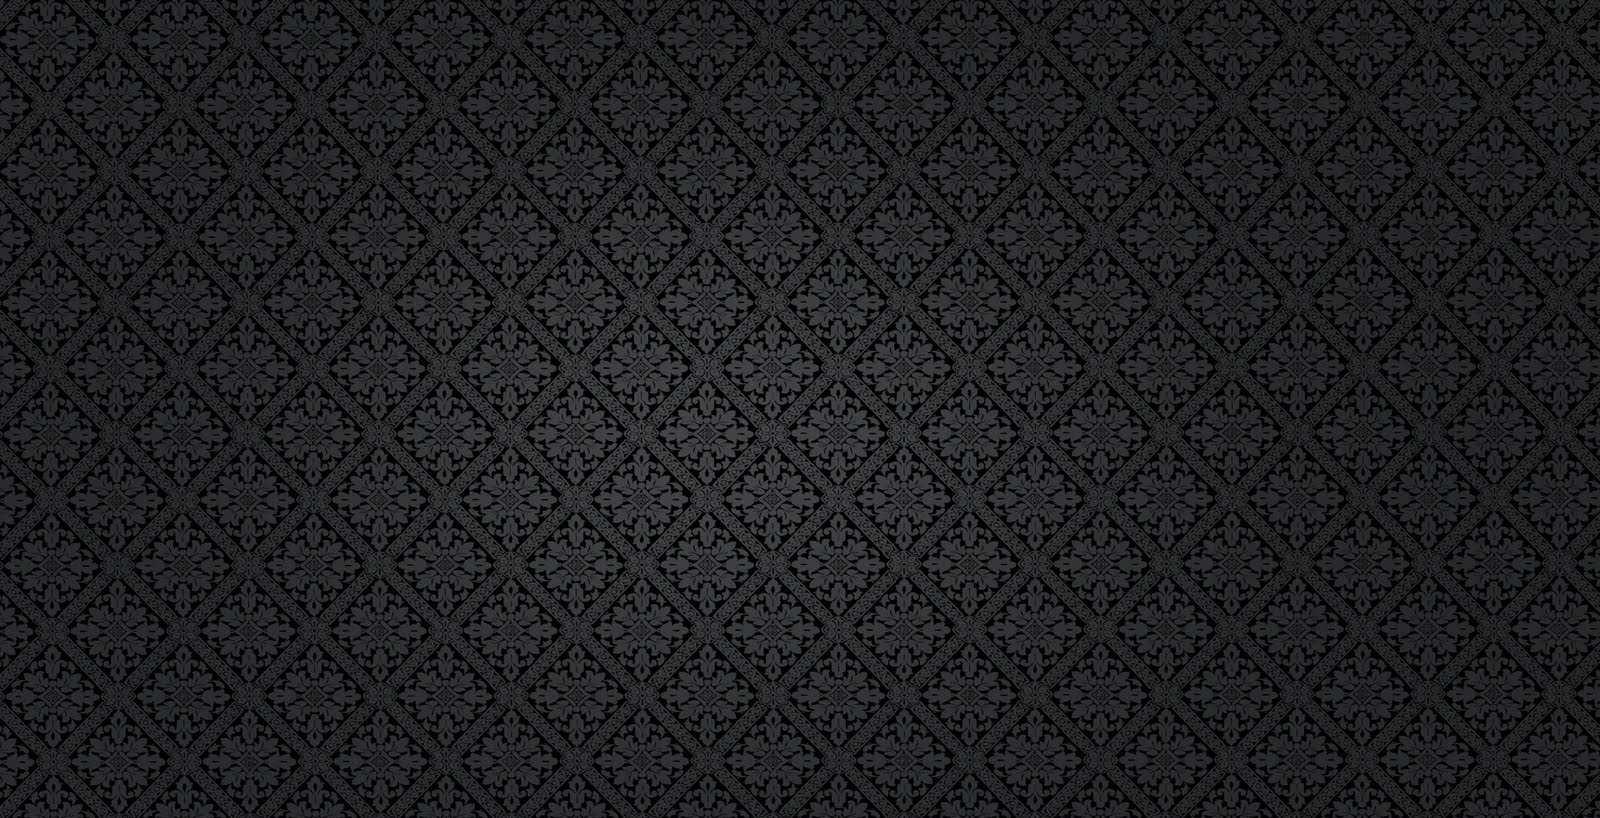 Dark Textures clipart background design black HD Hd Wallpaper Hd Background